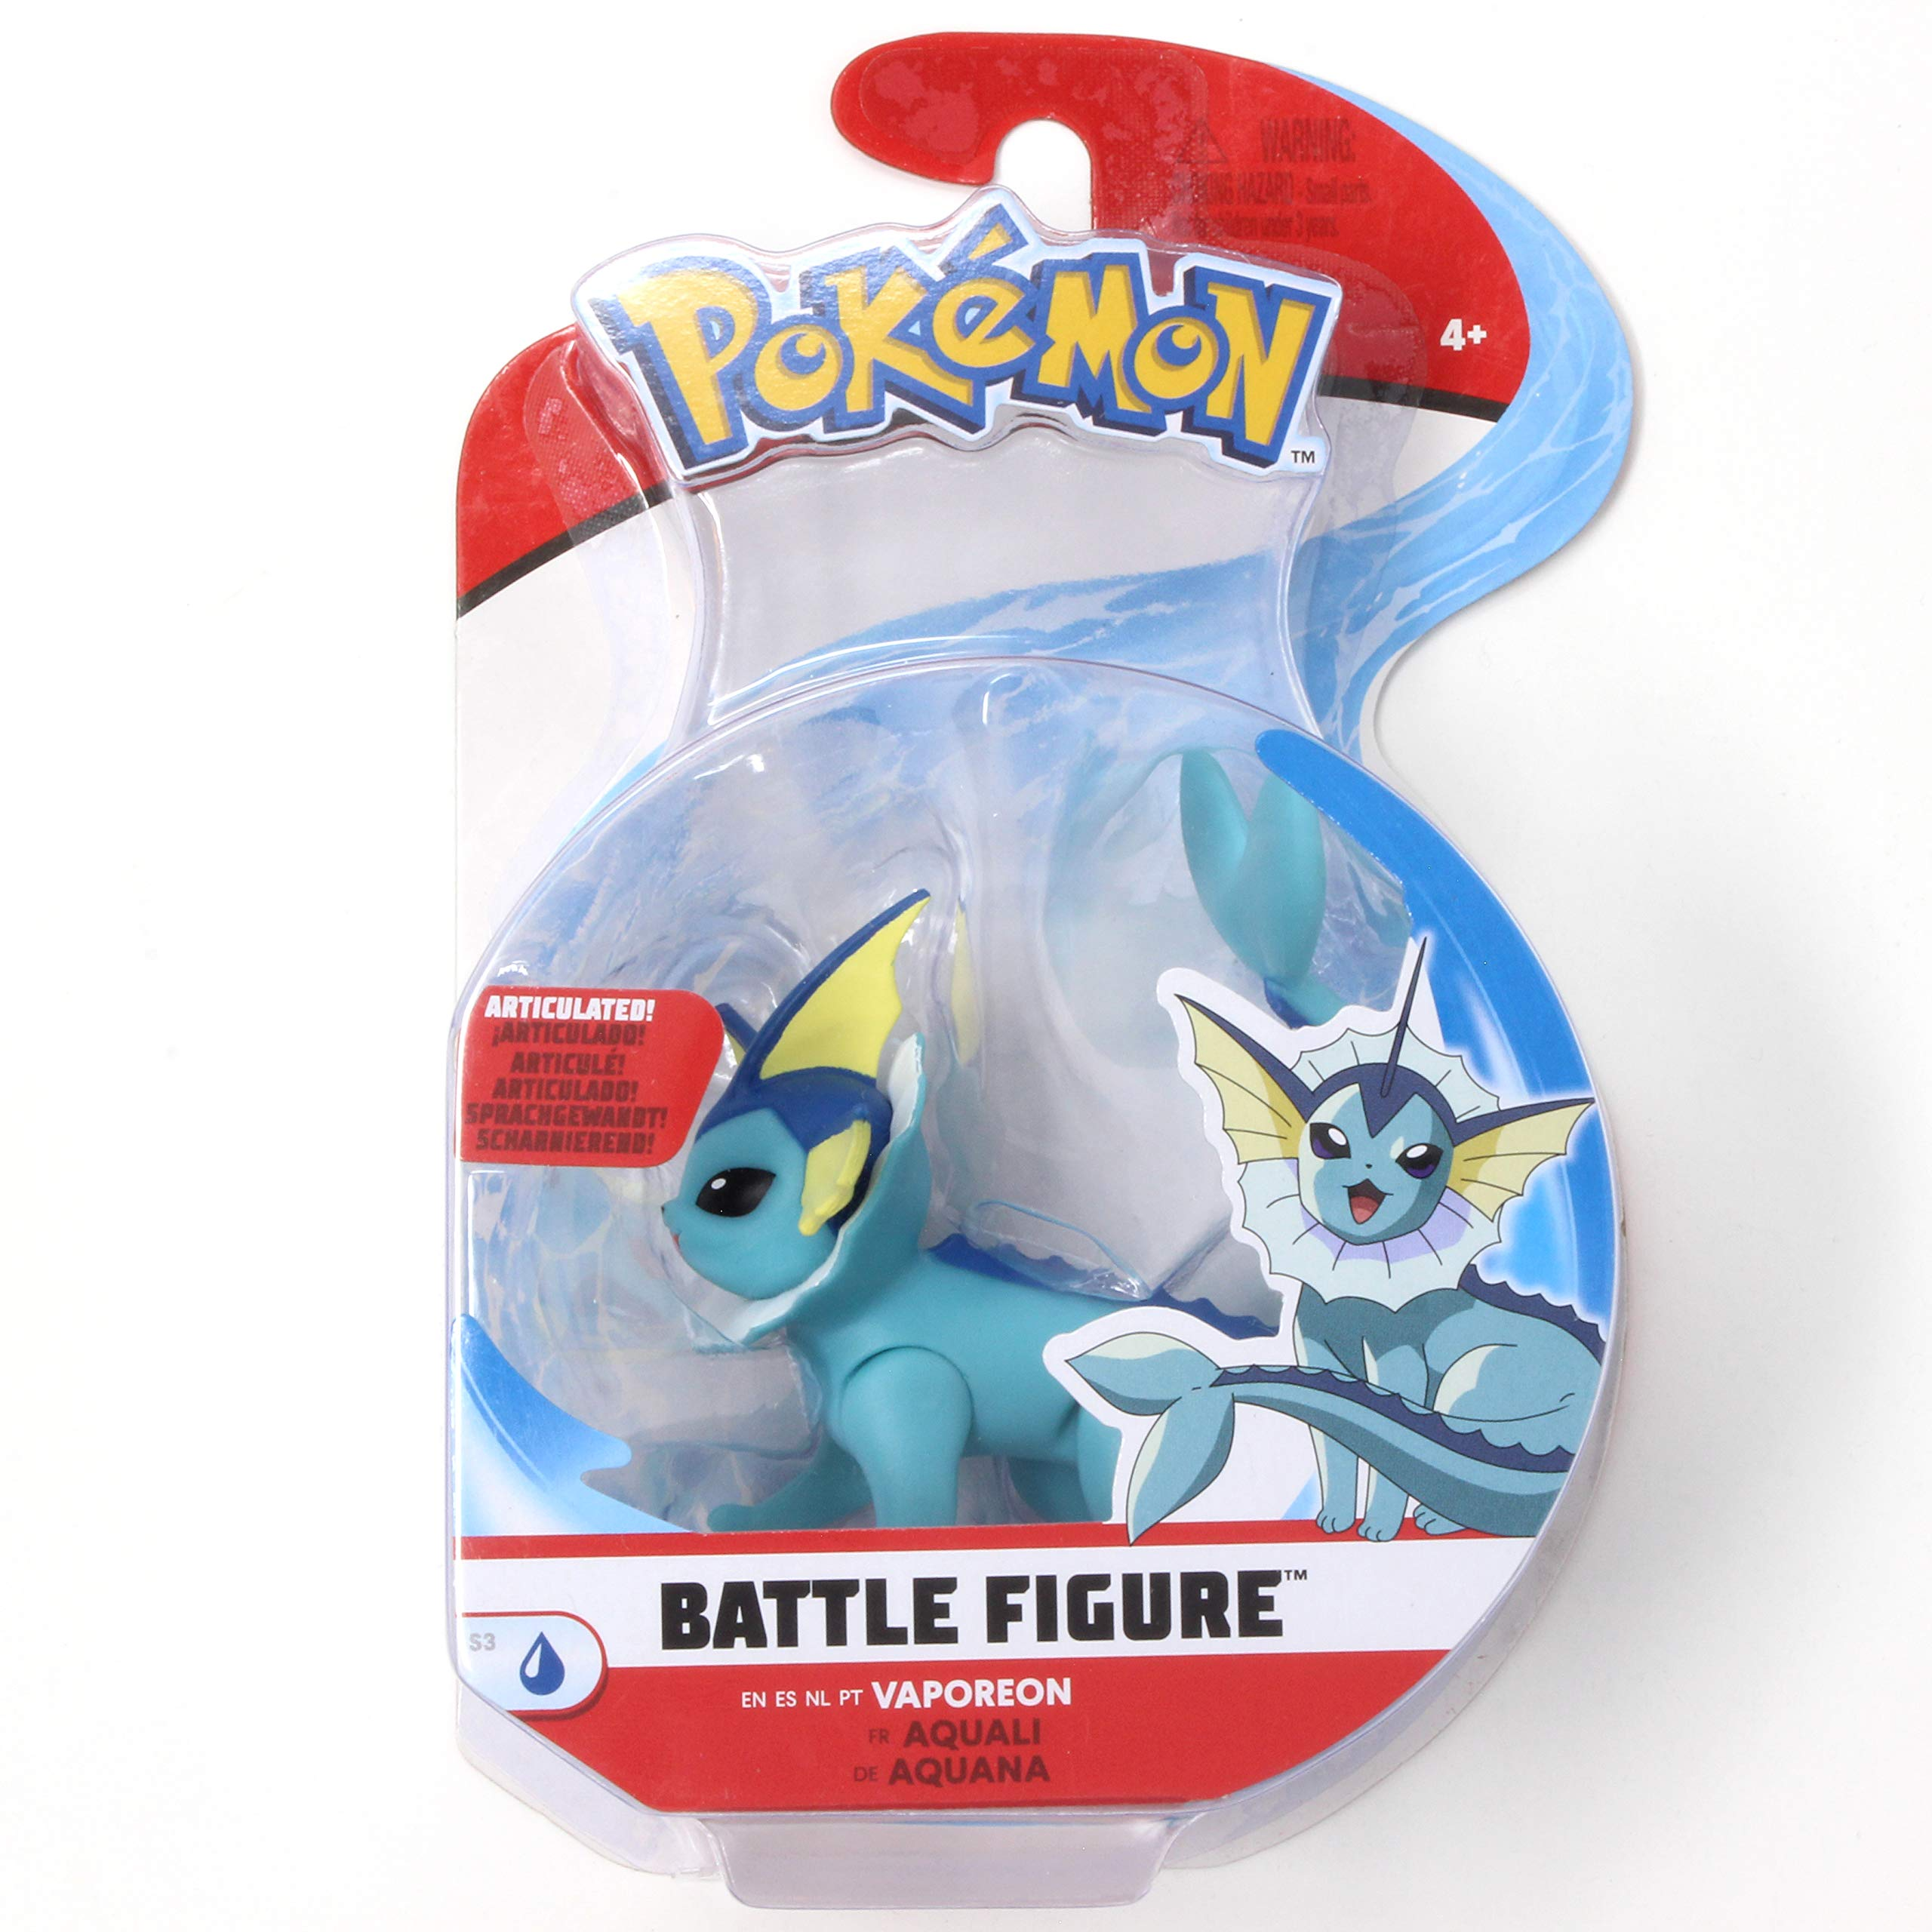 Amazon.com: Pokémon Battle Figure Vaporeon 3 Inch Series 3 Single Pack:  Toys & Games